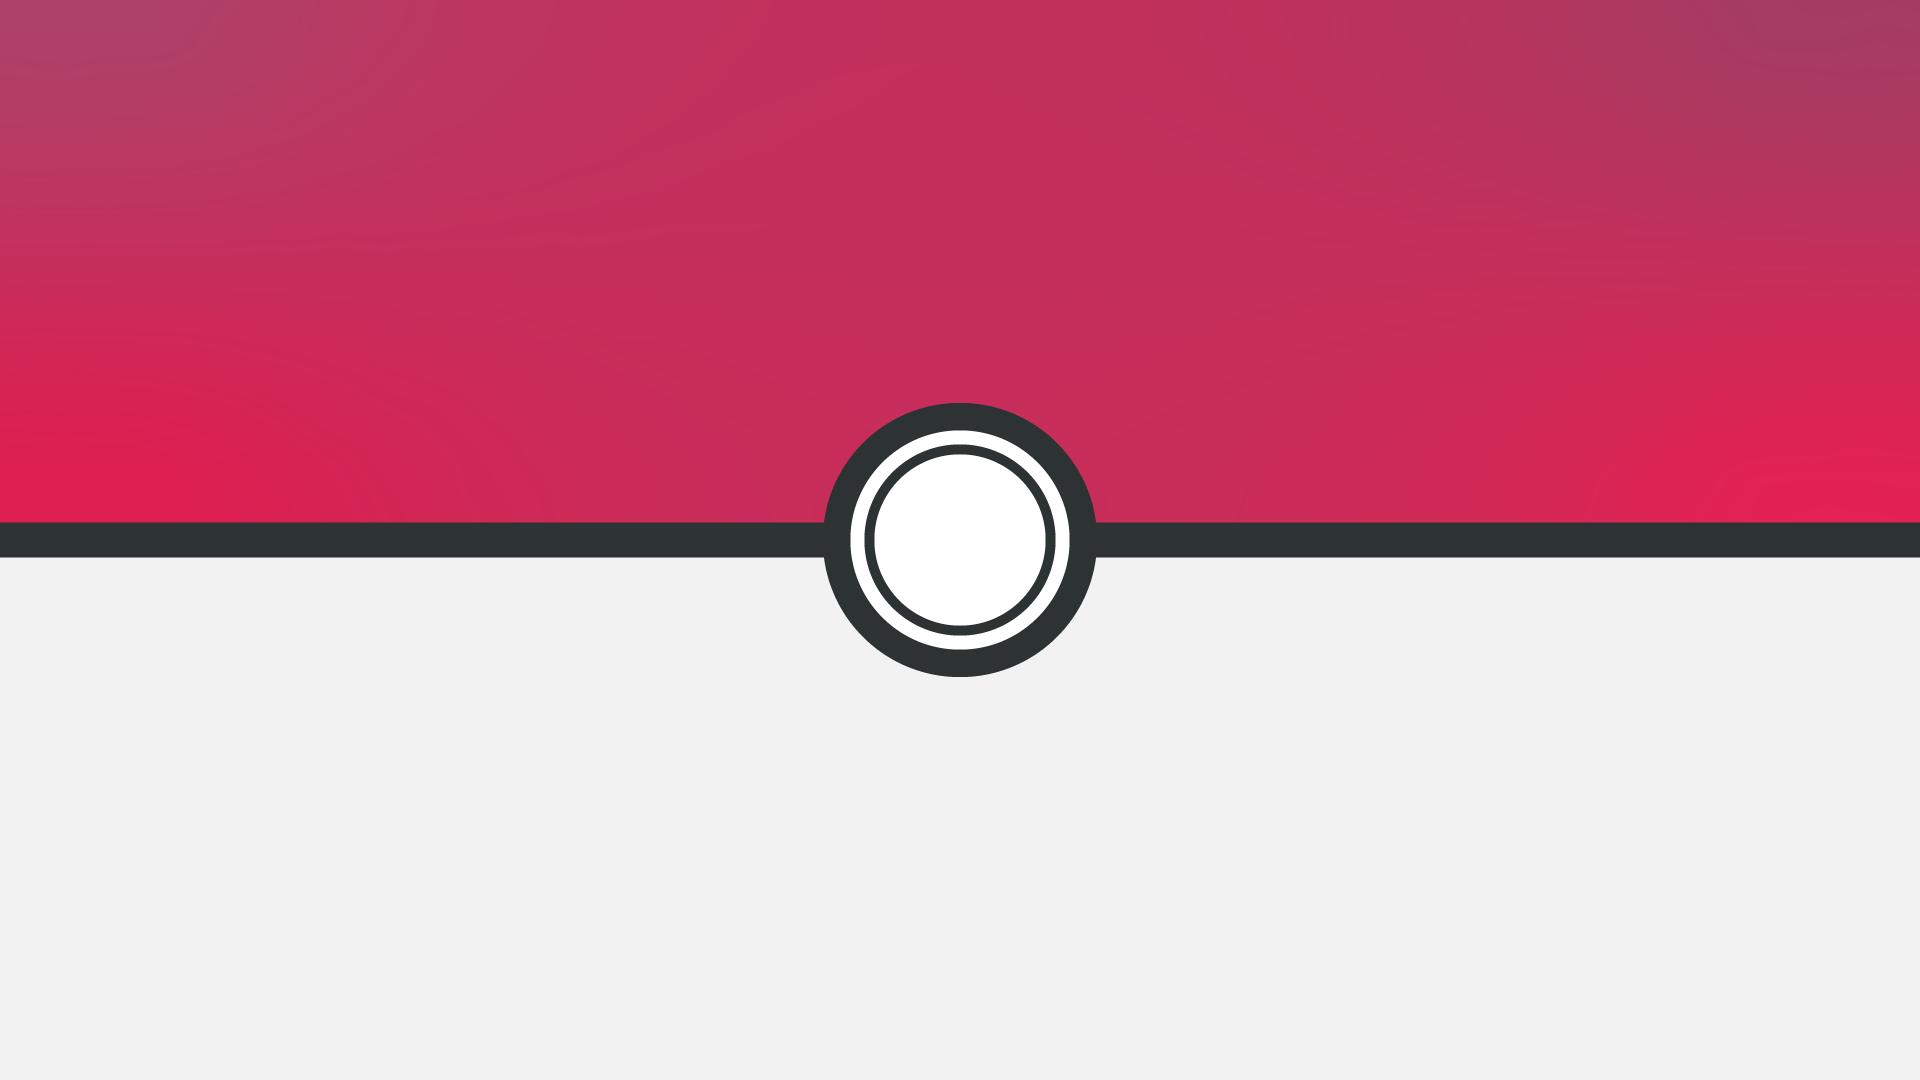 pokemon desktop wallpaper 4k